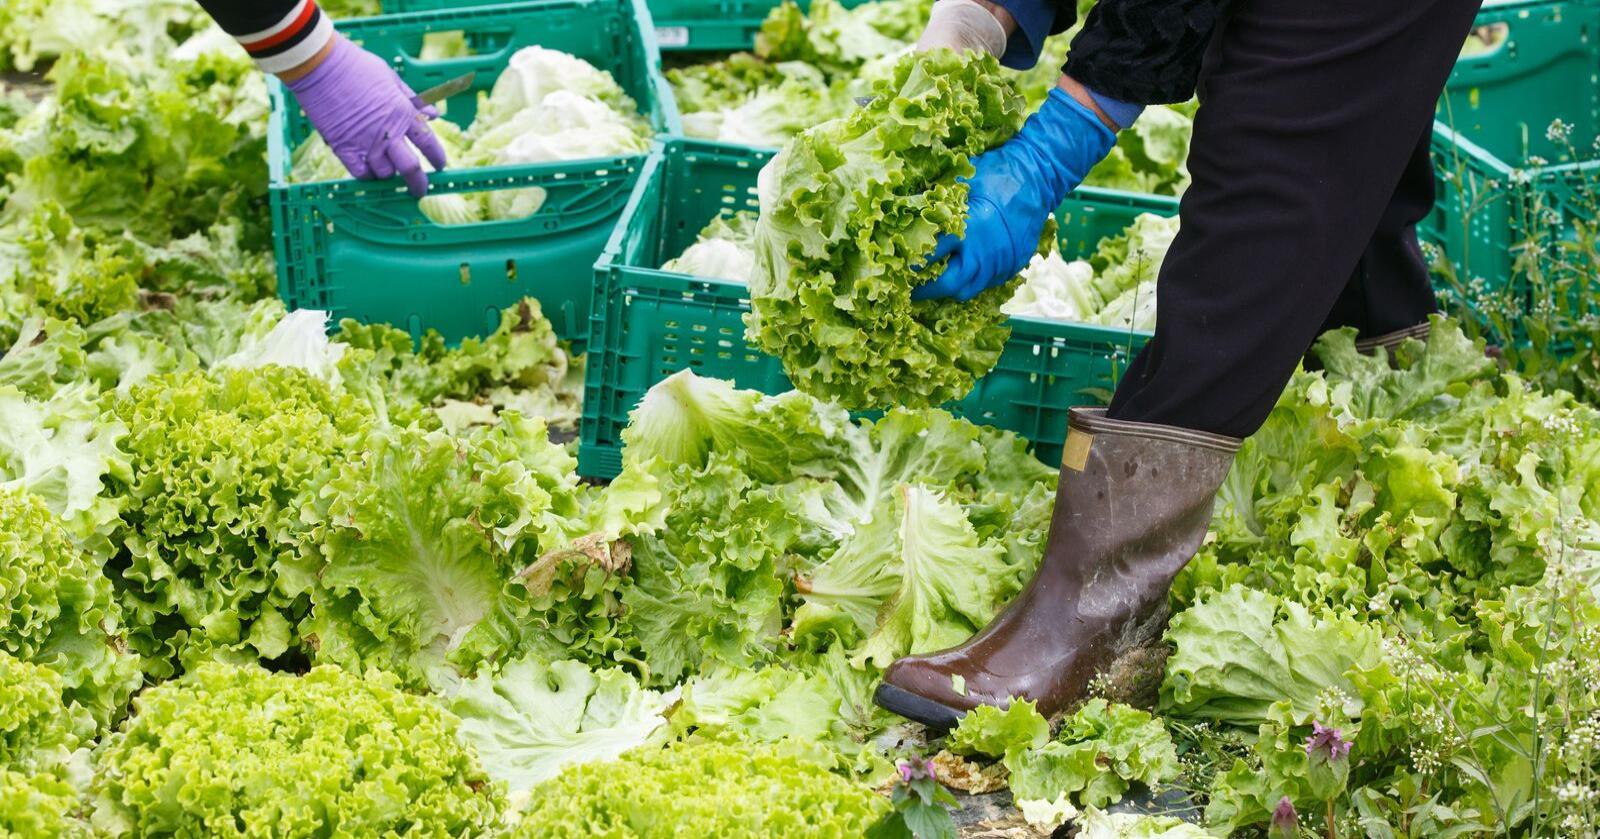 Foretrekker norsk: Coop ønsker mest mulig norsk bær, frukt og grønt i sine butikker, skriver innsenderen. Foto: Mostphotos